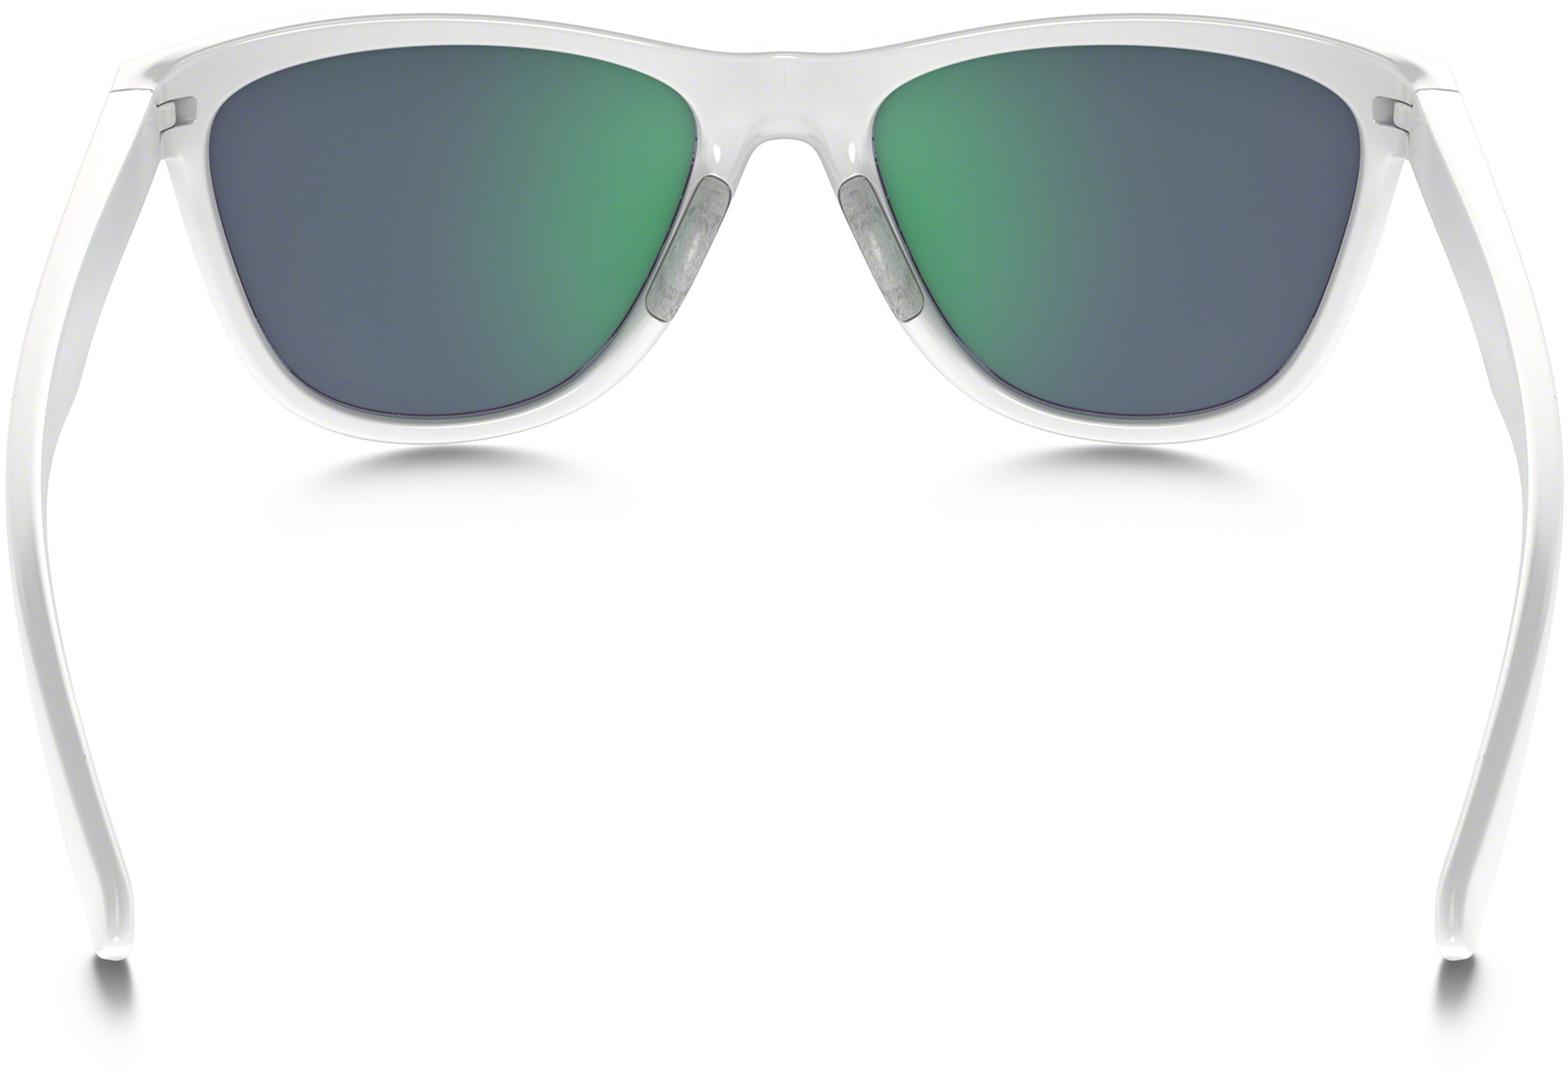 Oakley Moonlighter Sonnenbrille Polished White/Jade Iridium FbSF7P